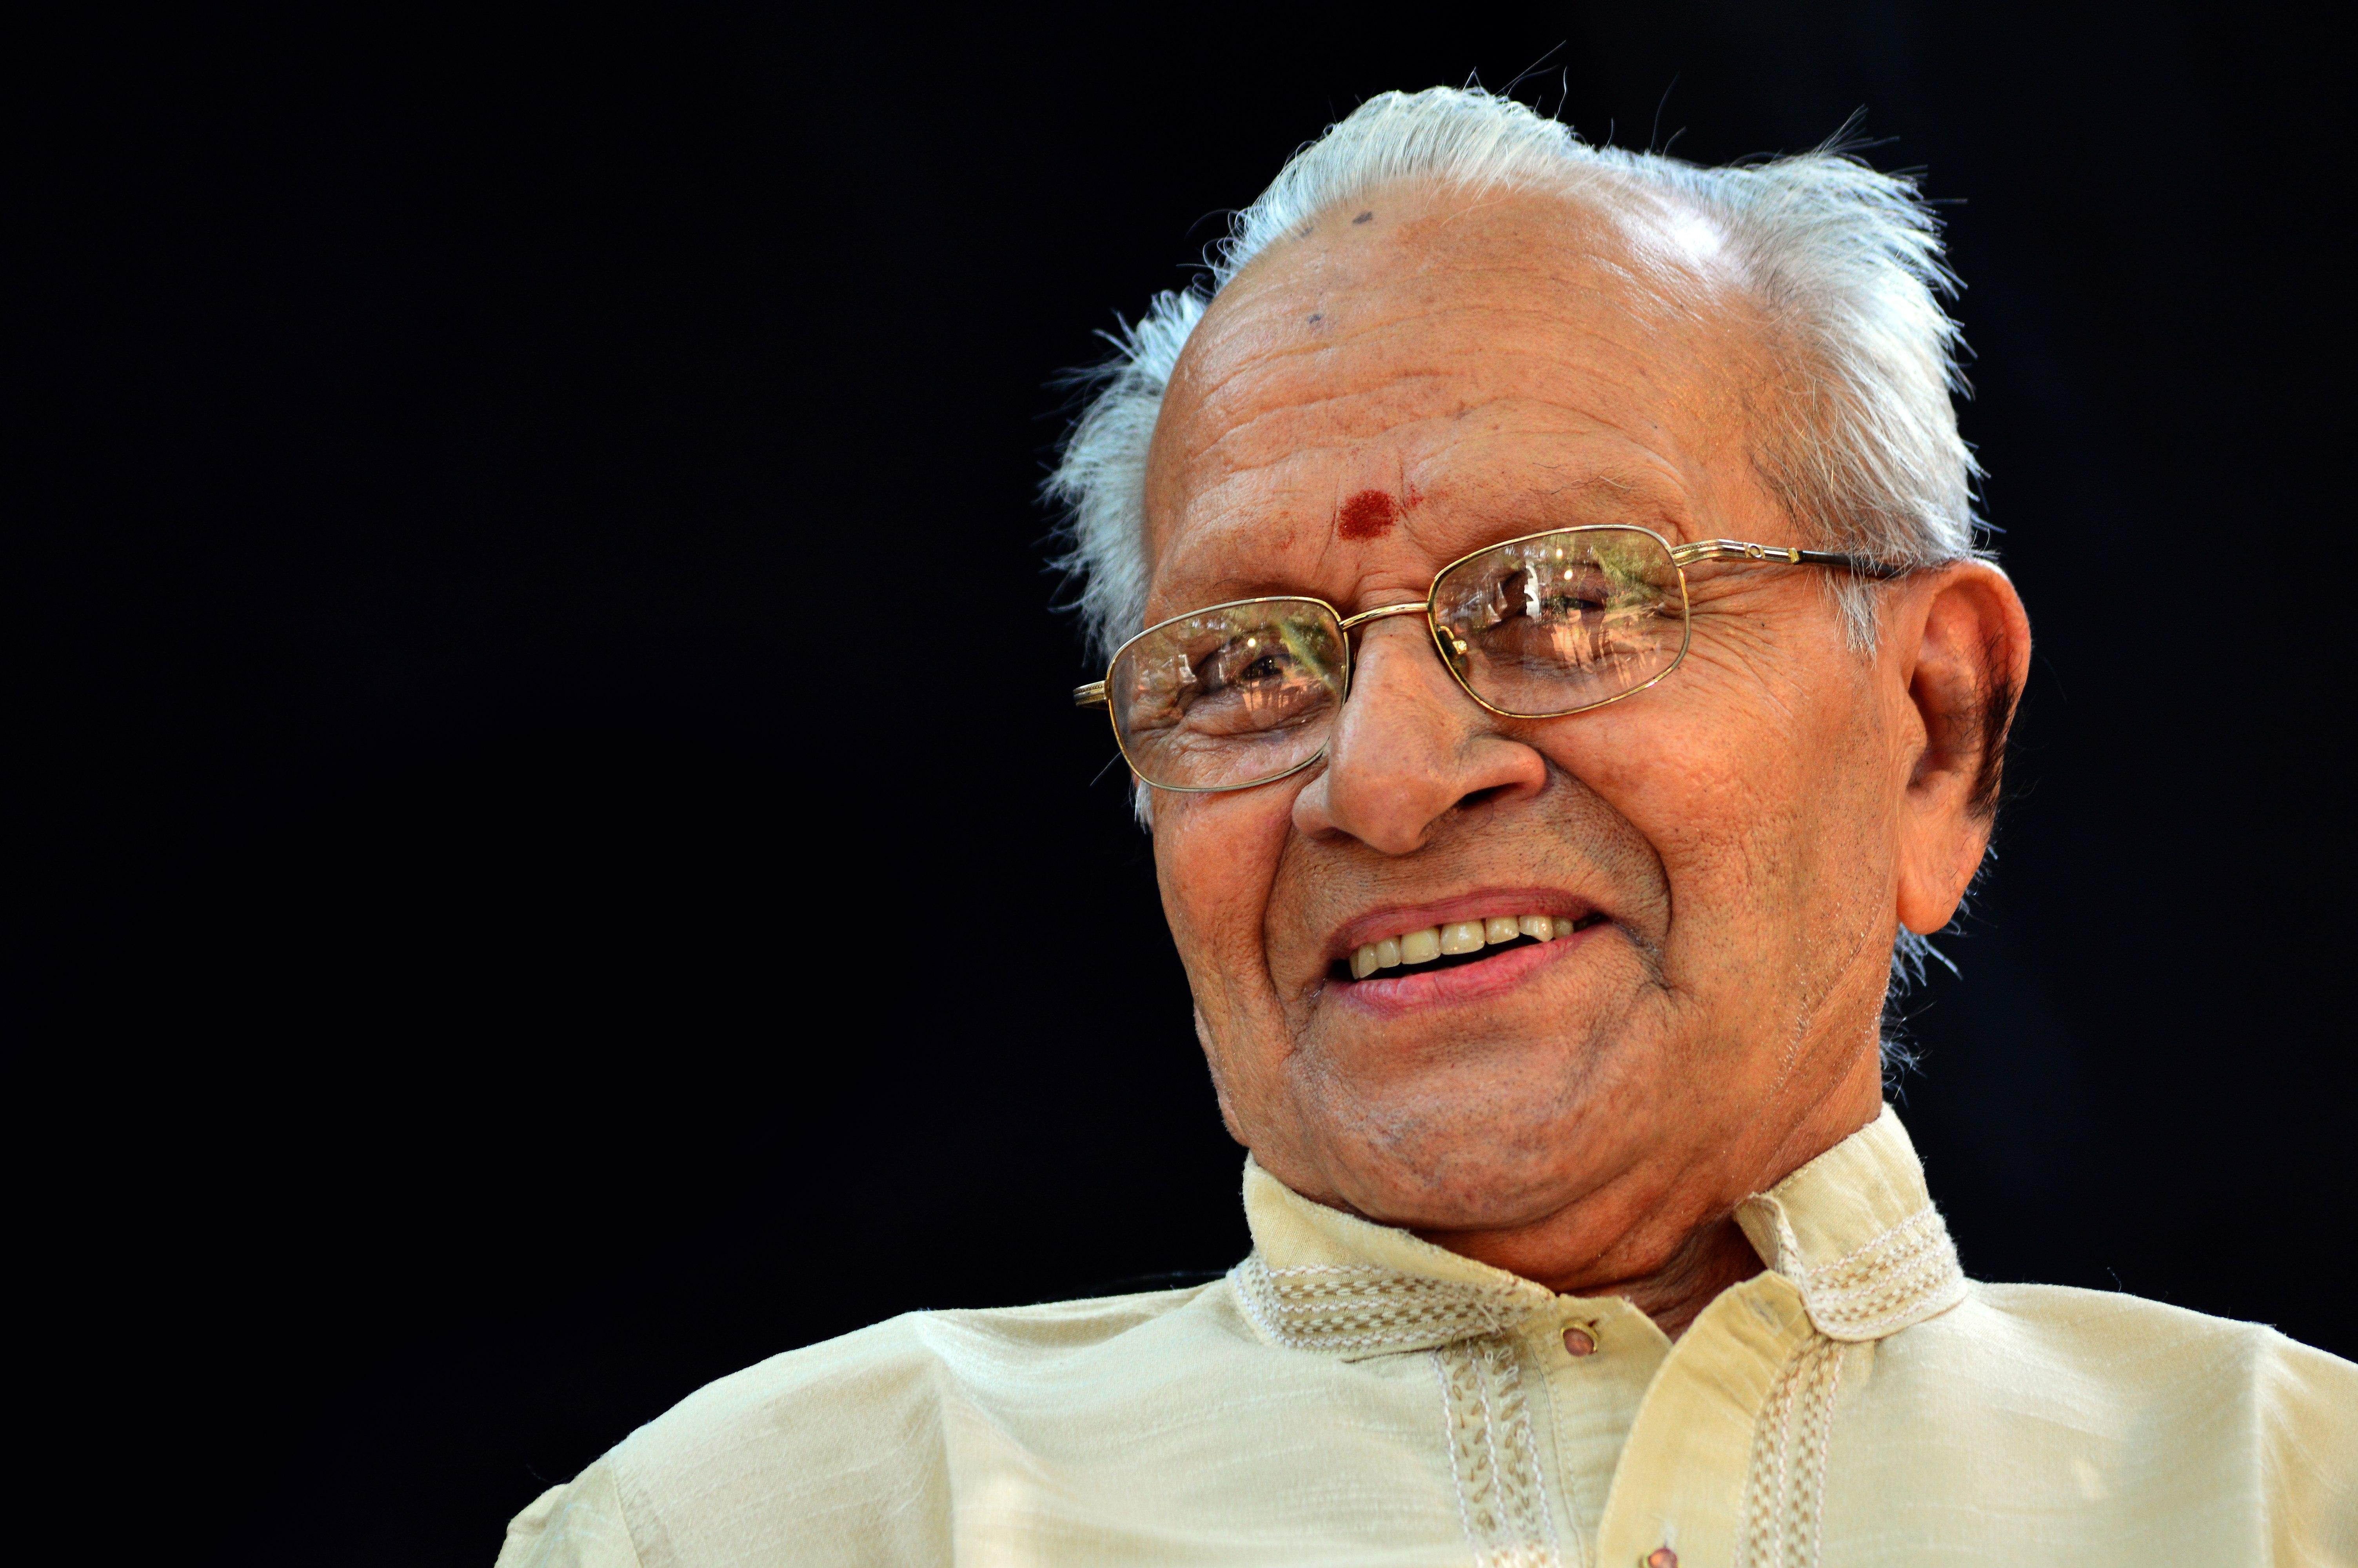 Madavoor Vasudevan Nair - The complete information and online sale